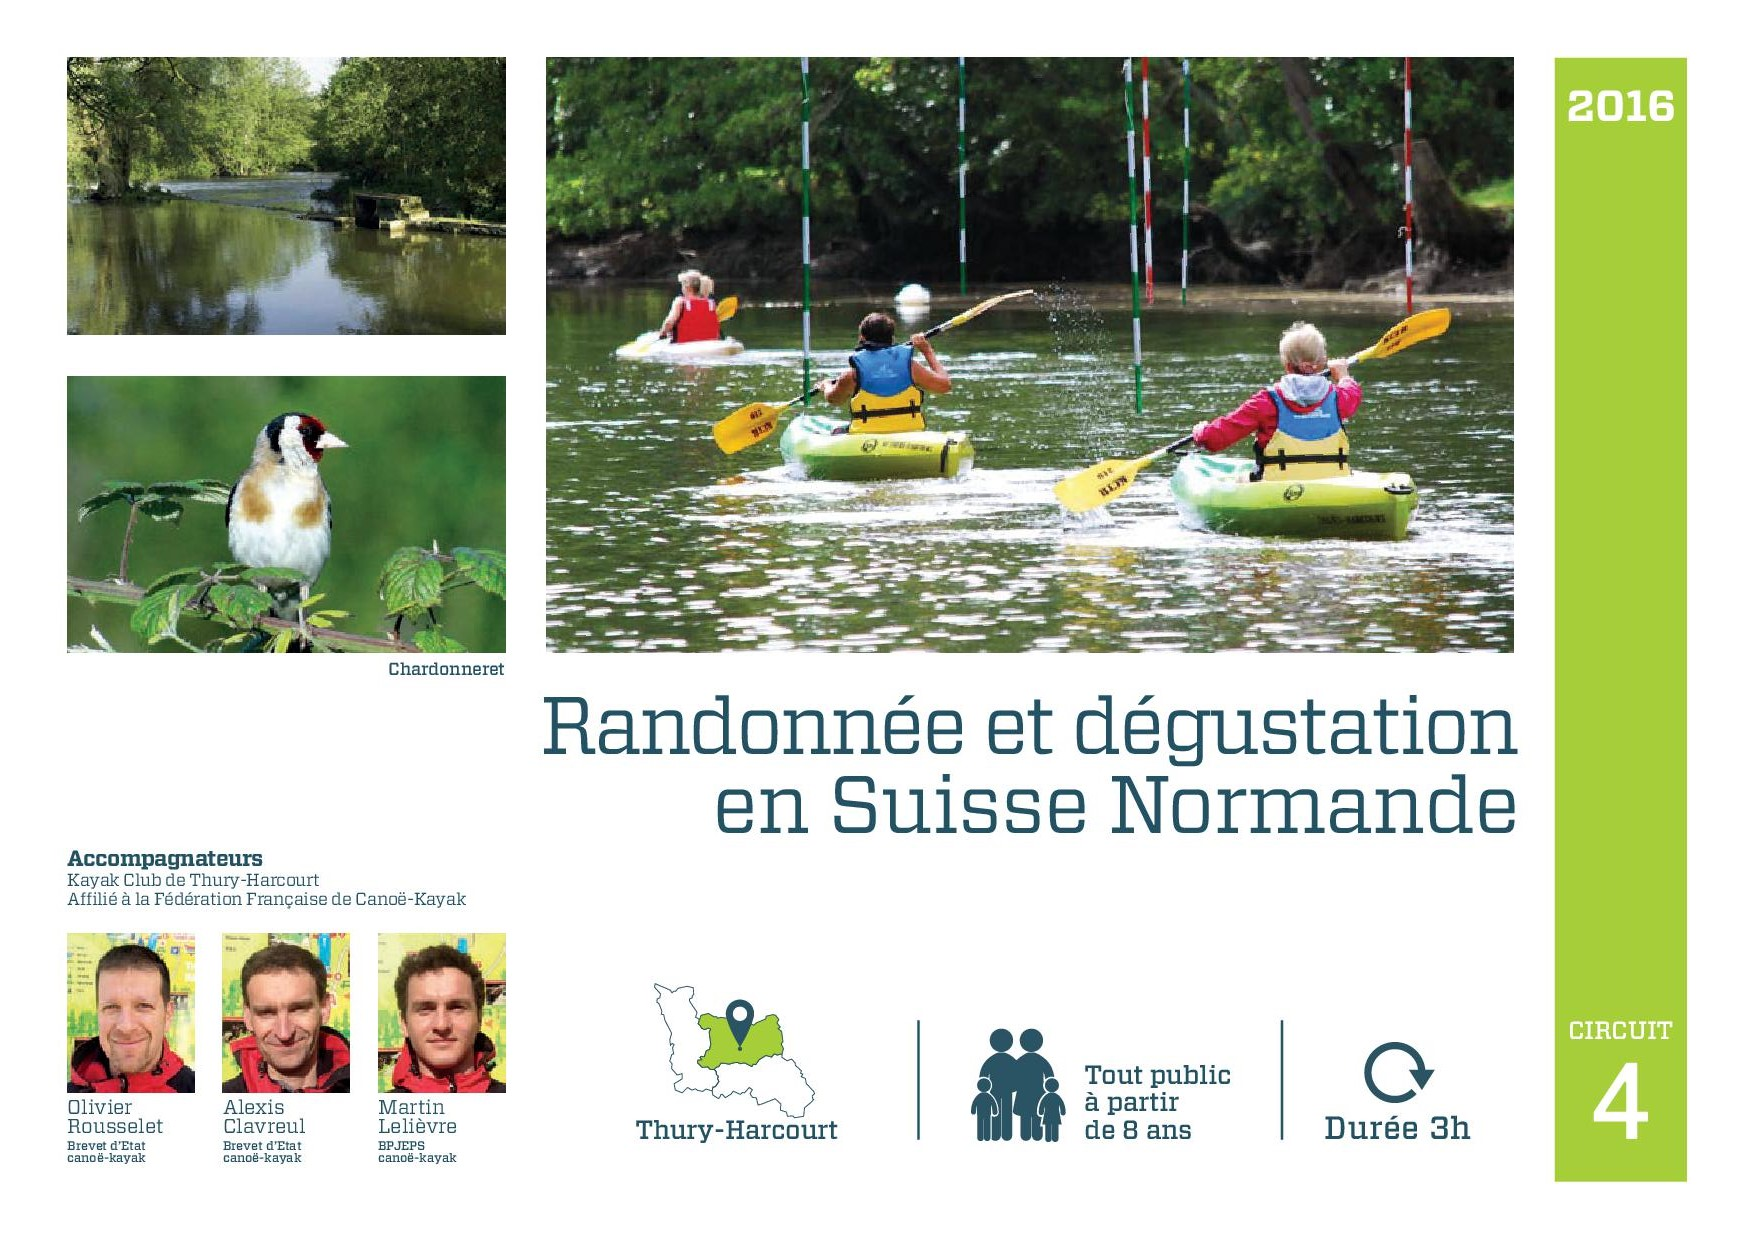 Randonnee degustation Thury Harcourt Suisse Normande canoe kayak riviere